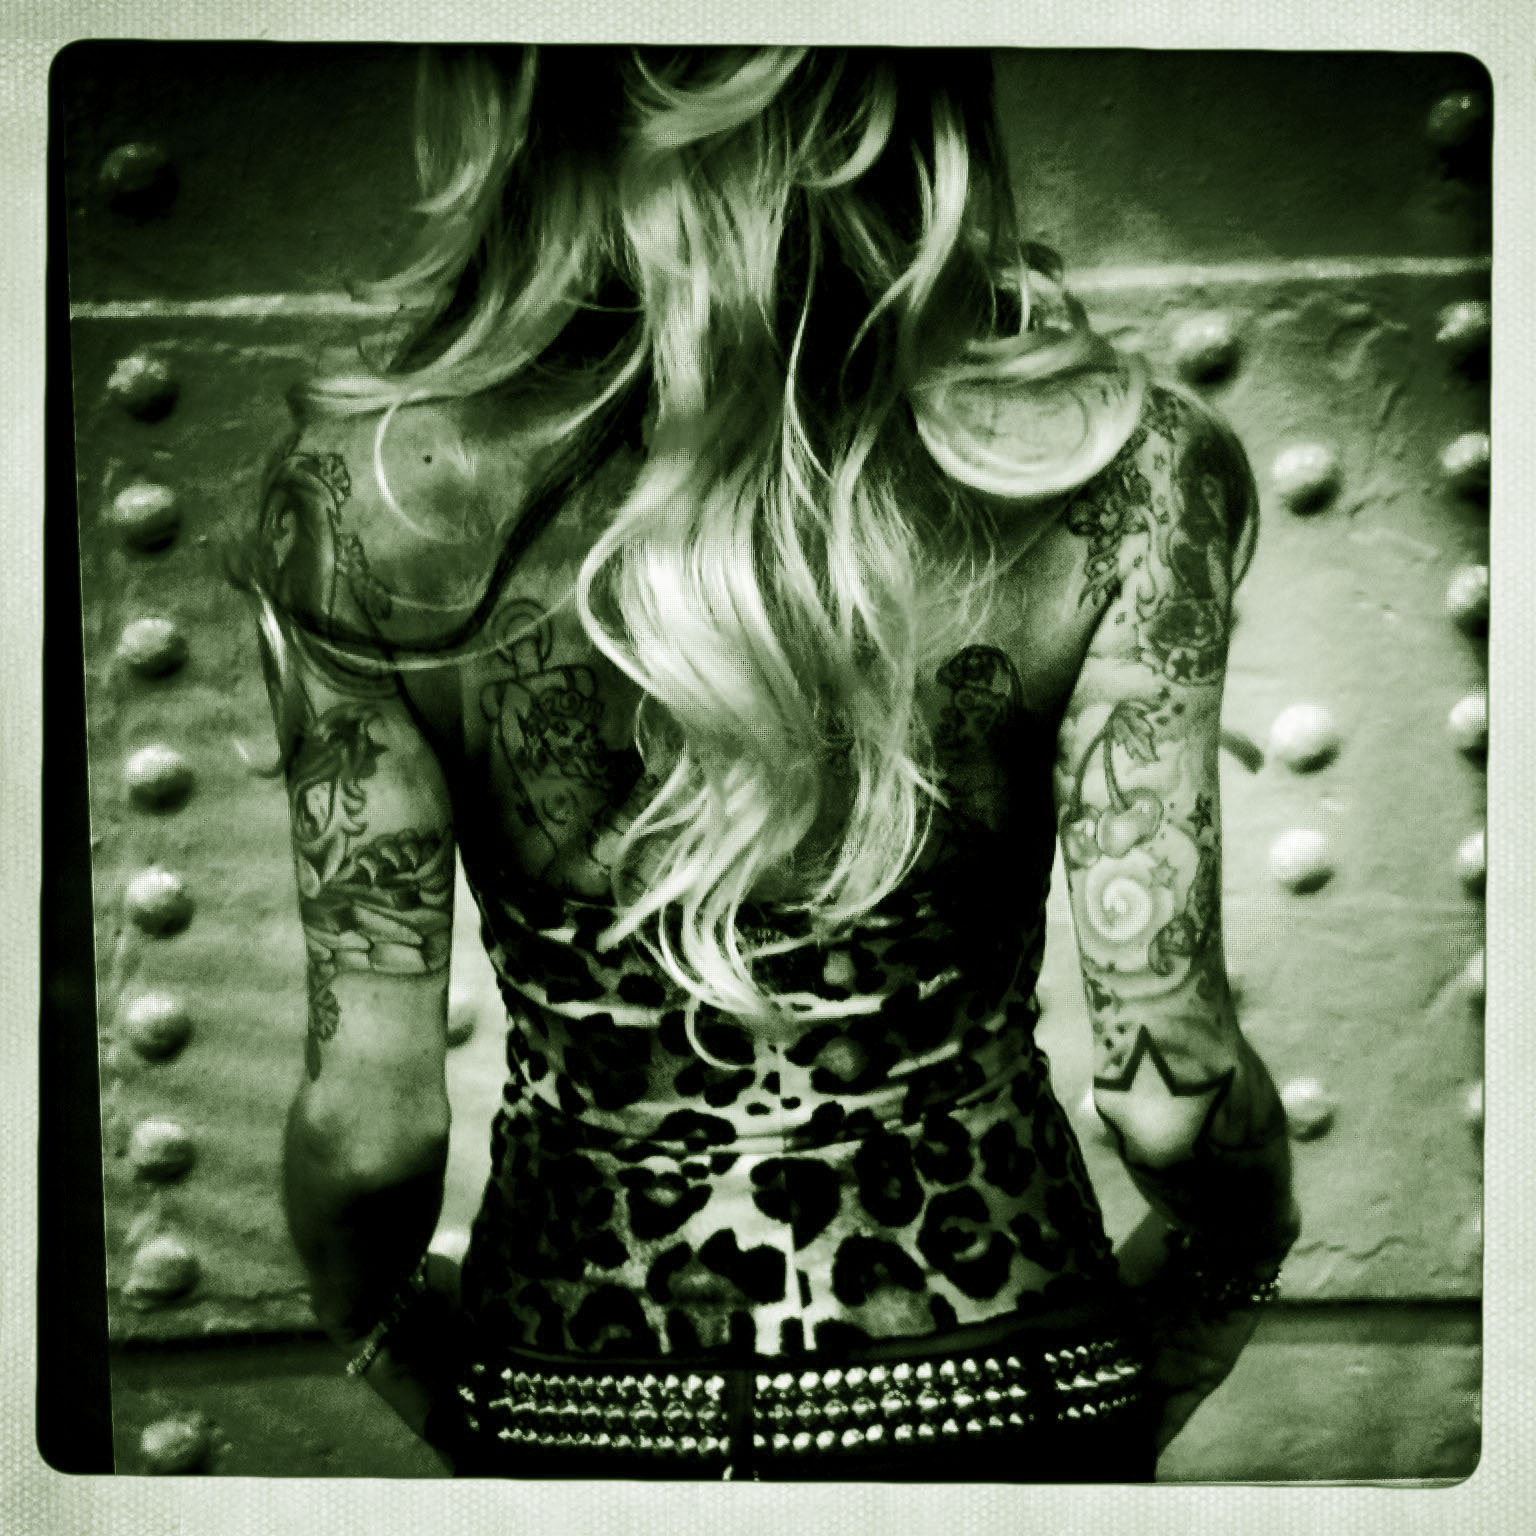 hipsta,tony,smith,hipstamatic,tonysmith,hotpix,tonysmithhotpix,hot,pix,pics,picks,hotpics,hotpicks,girl,woman,sexy,long,blond,hair,tats,tat,slim,leopard,print,skin,tatoo,tattoo,star,studs,studded,leather,belt,back,iron,metal,rivit,rivet,rivets,manchester,convention,gmex,central,2011,march,2010,2012,tony smith photography,racy,tdktony,tdk,tdktonysmith,hotpix.com